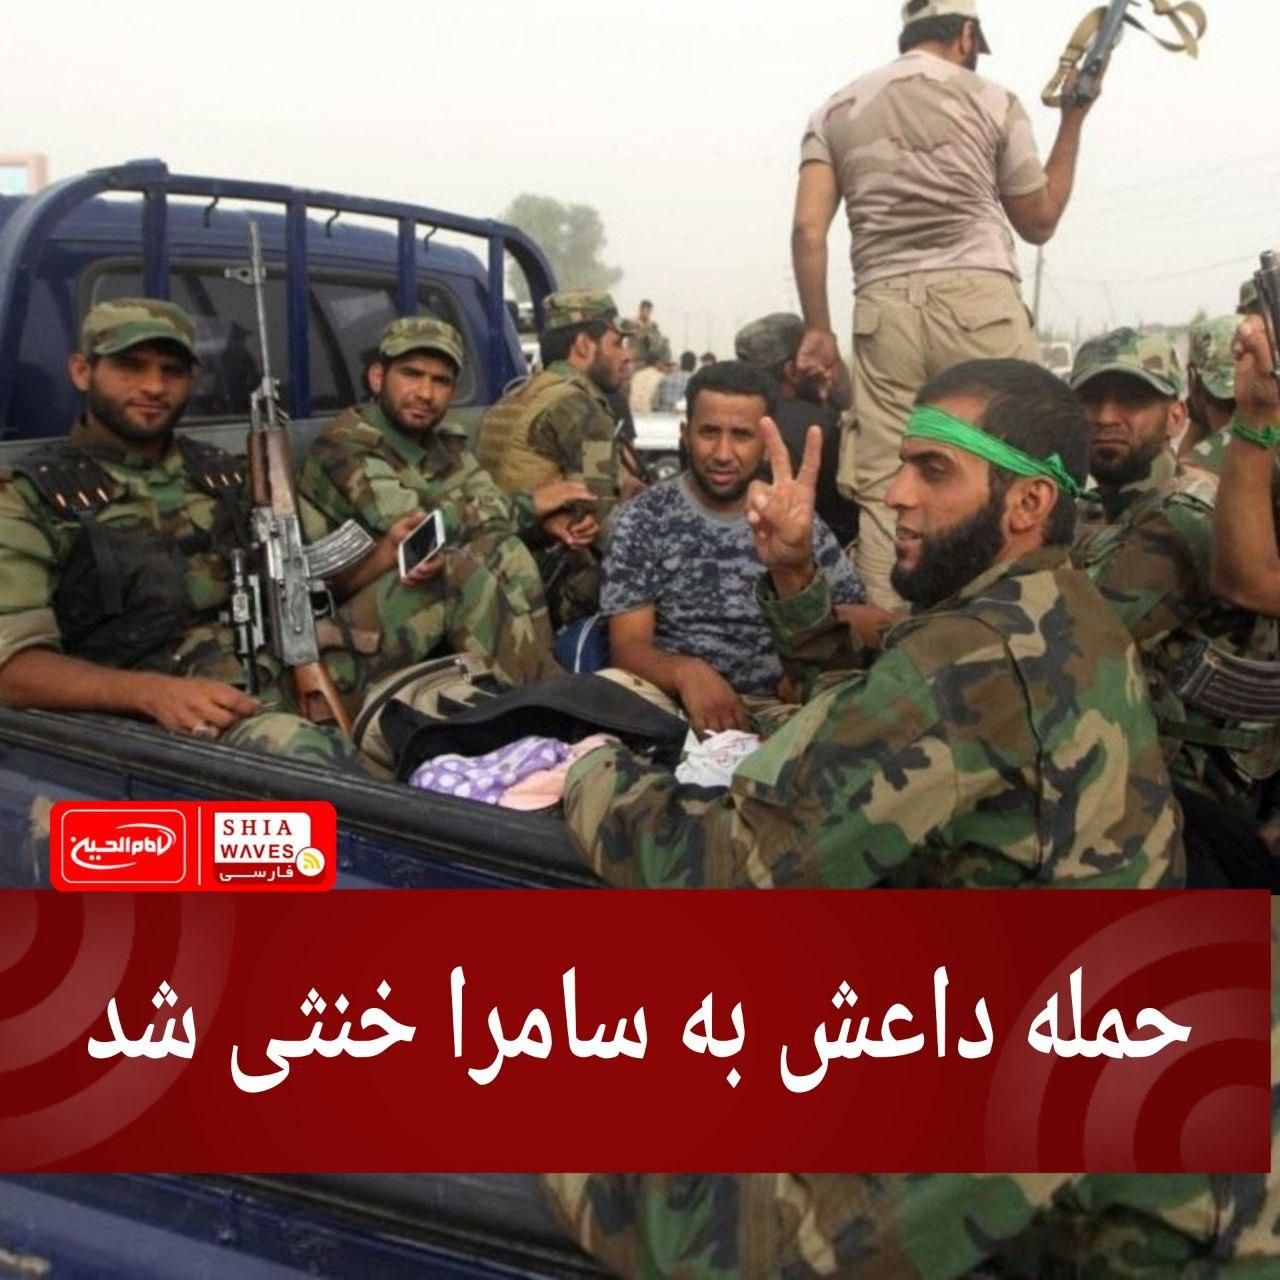 تصویر حمله داعش به سامرا خنثی شد